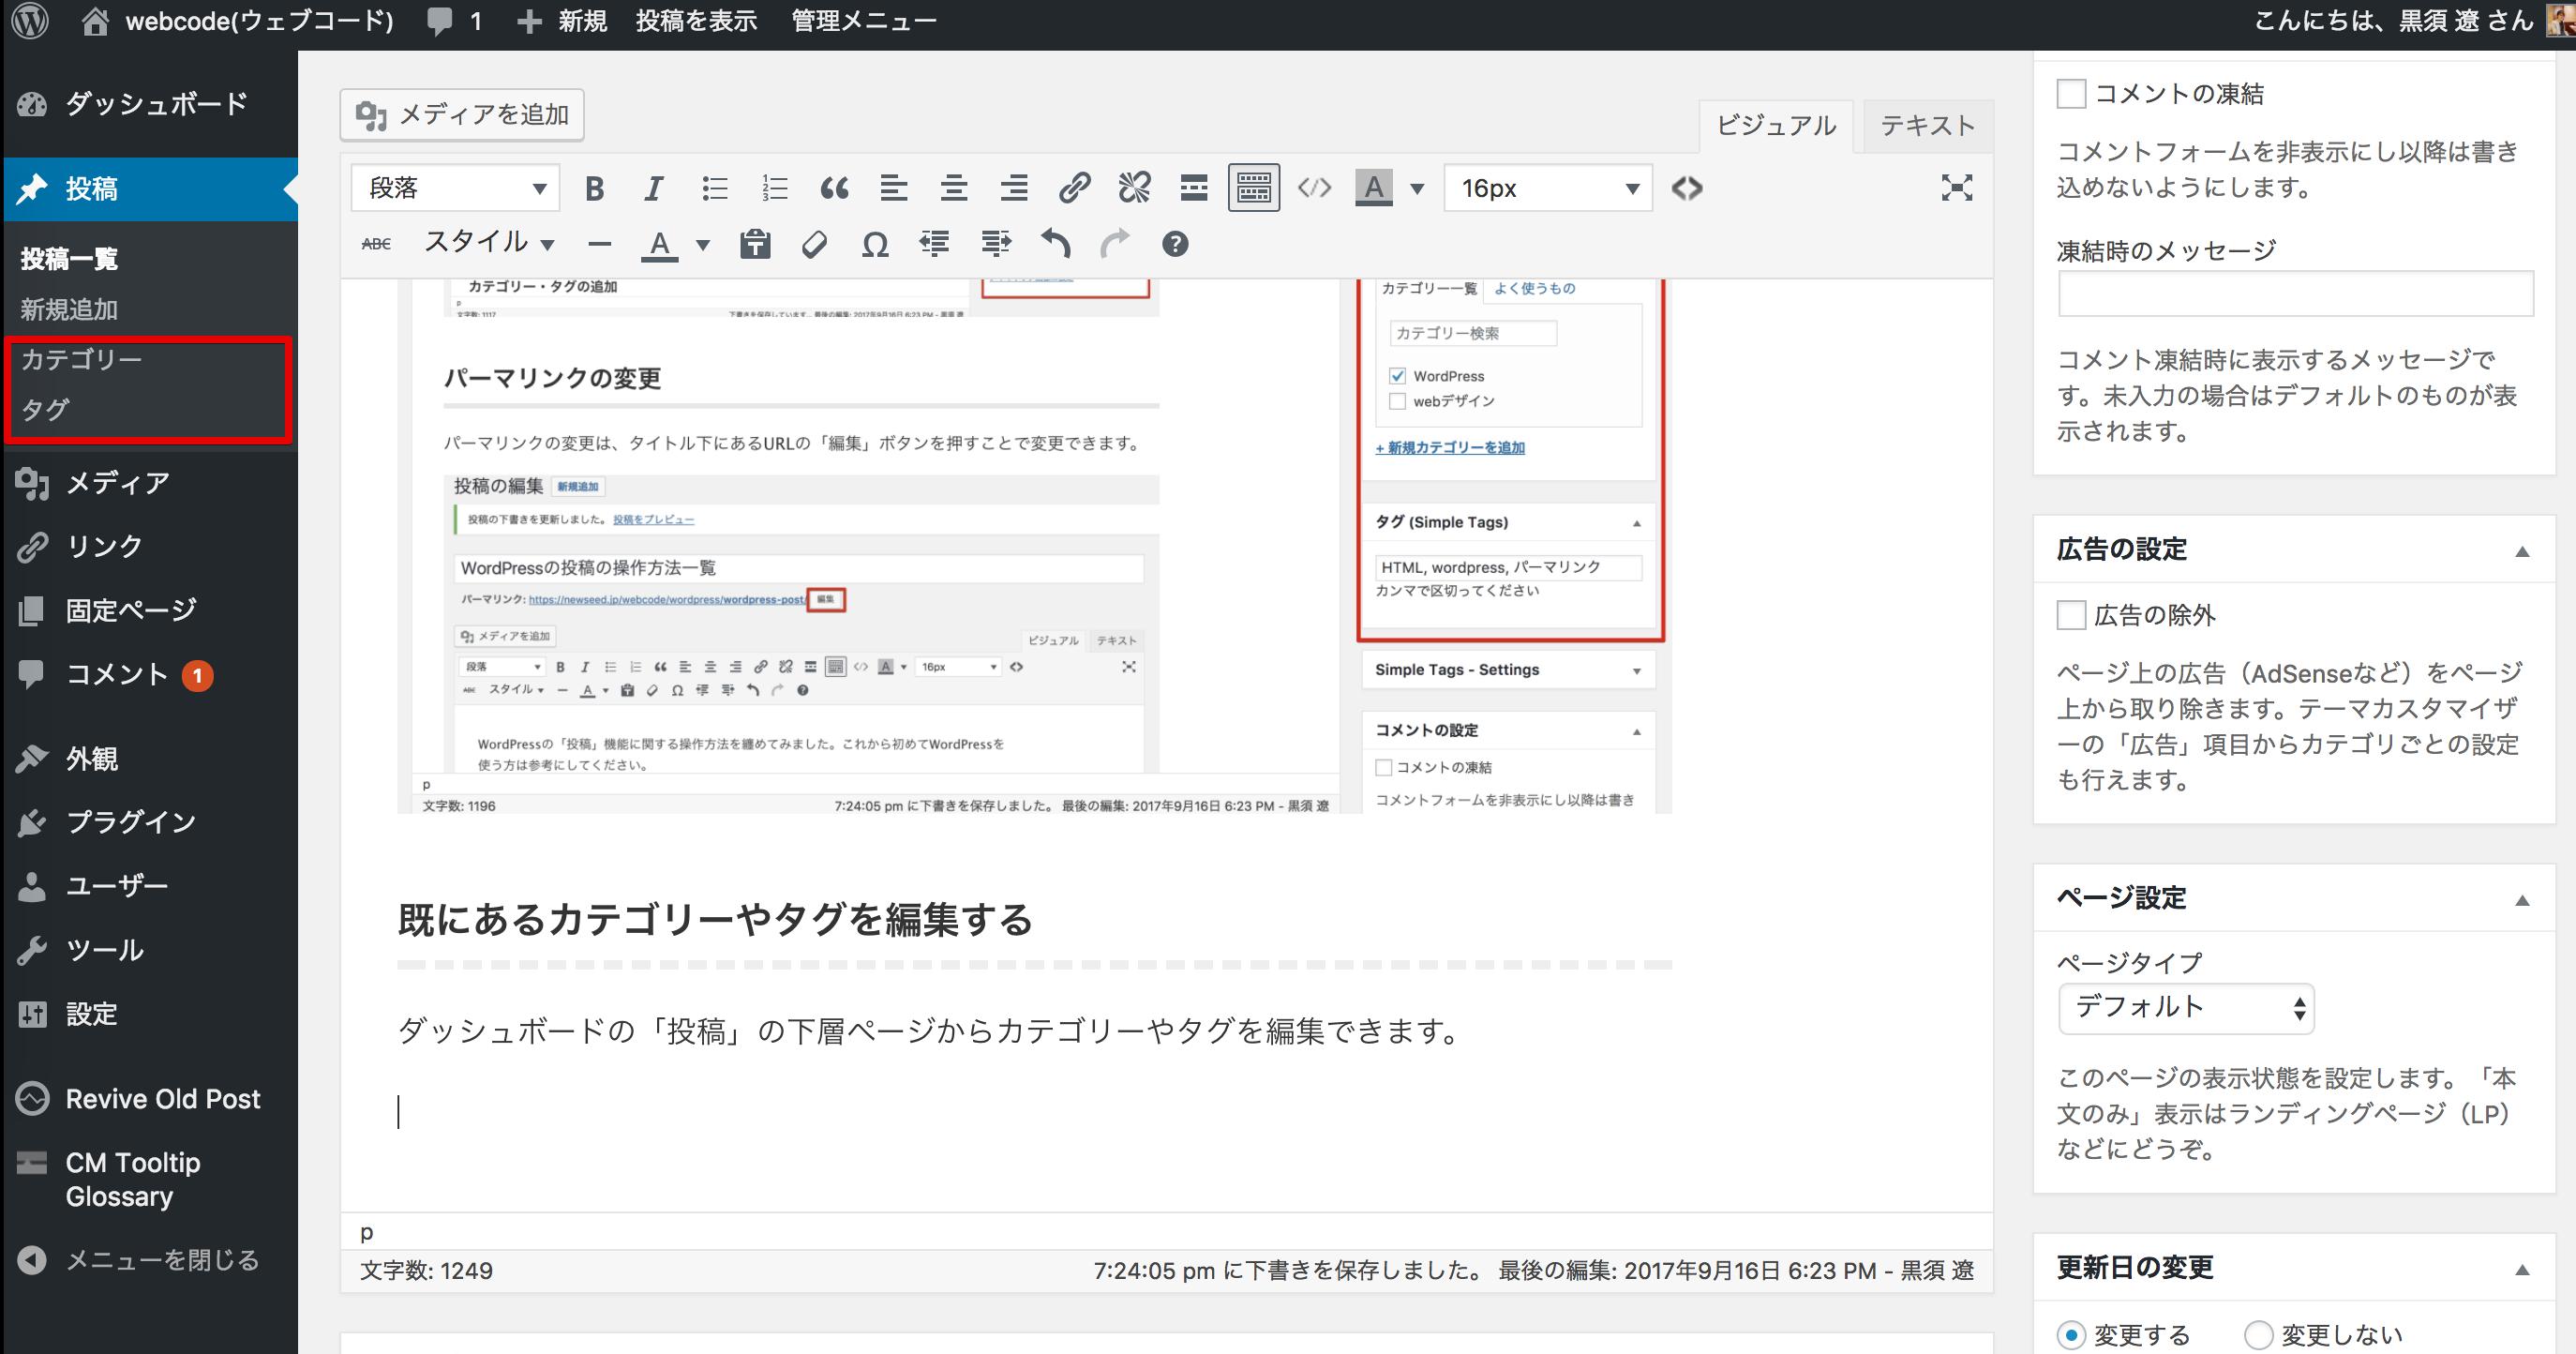 8ac8db187cacef8cbd055b94149d45de 1 - 初心者向け!WordPressの投稿方法や記事の編集方法を徹底解説